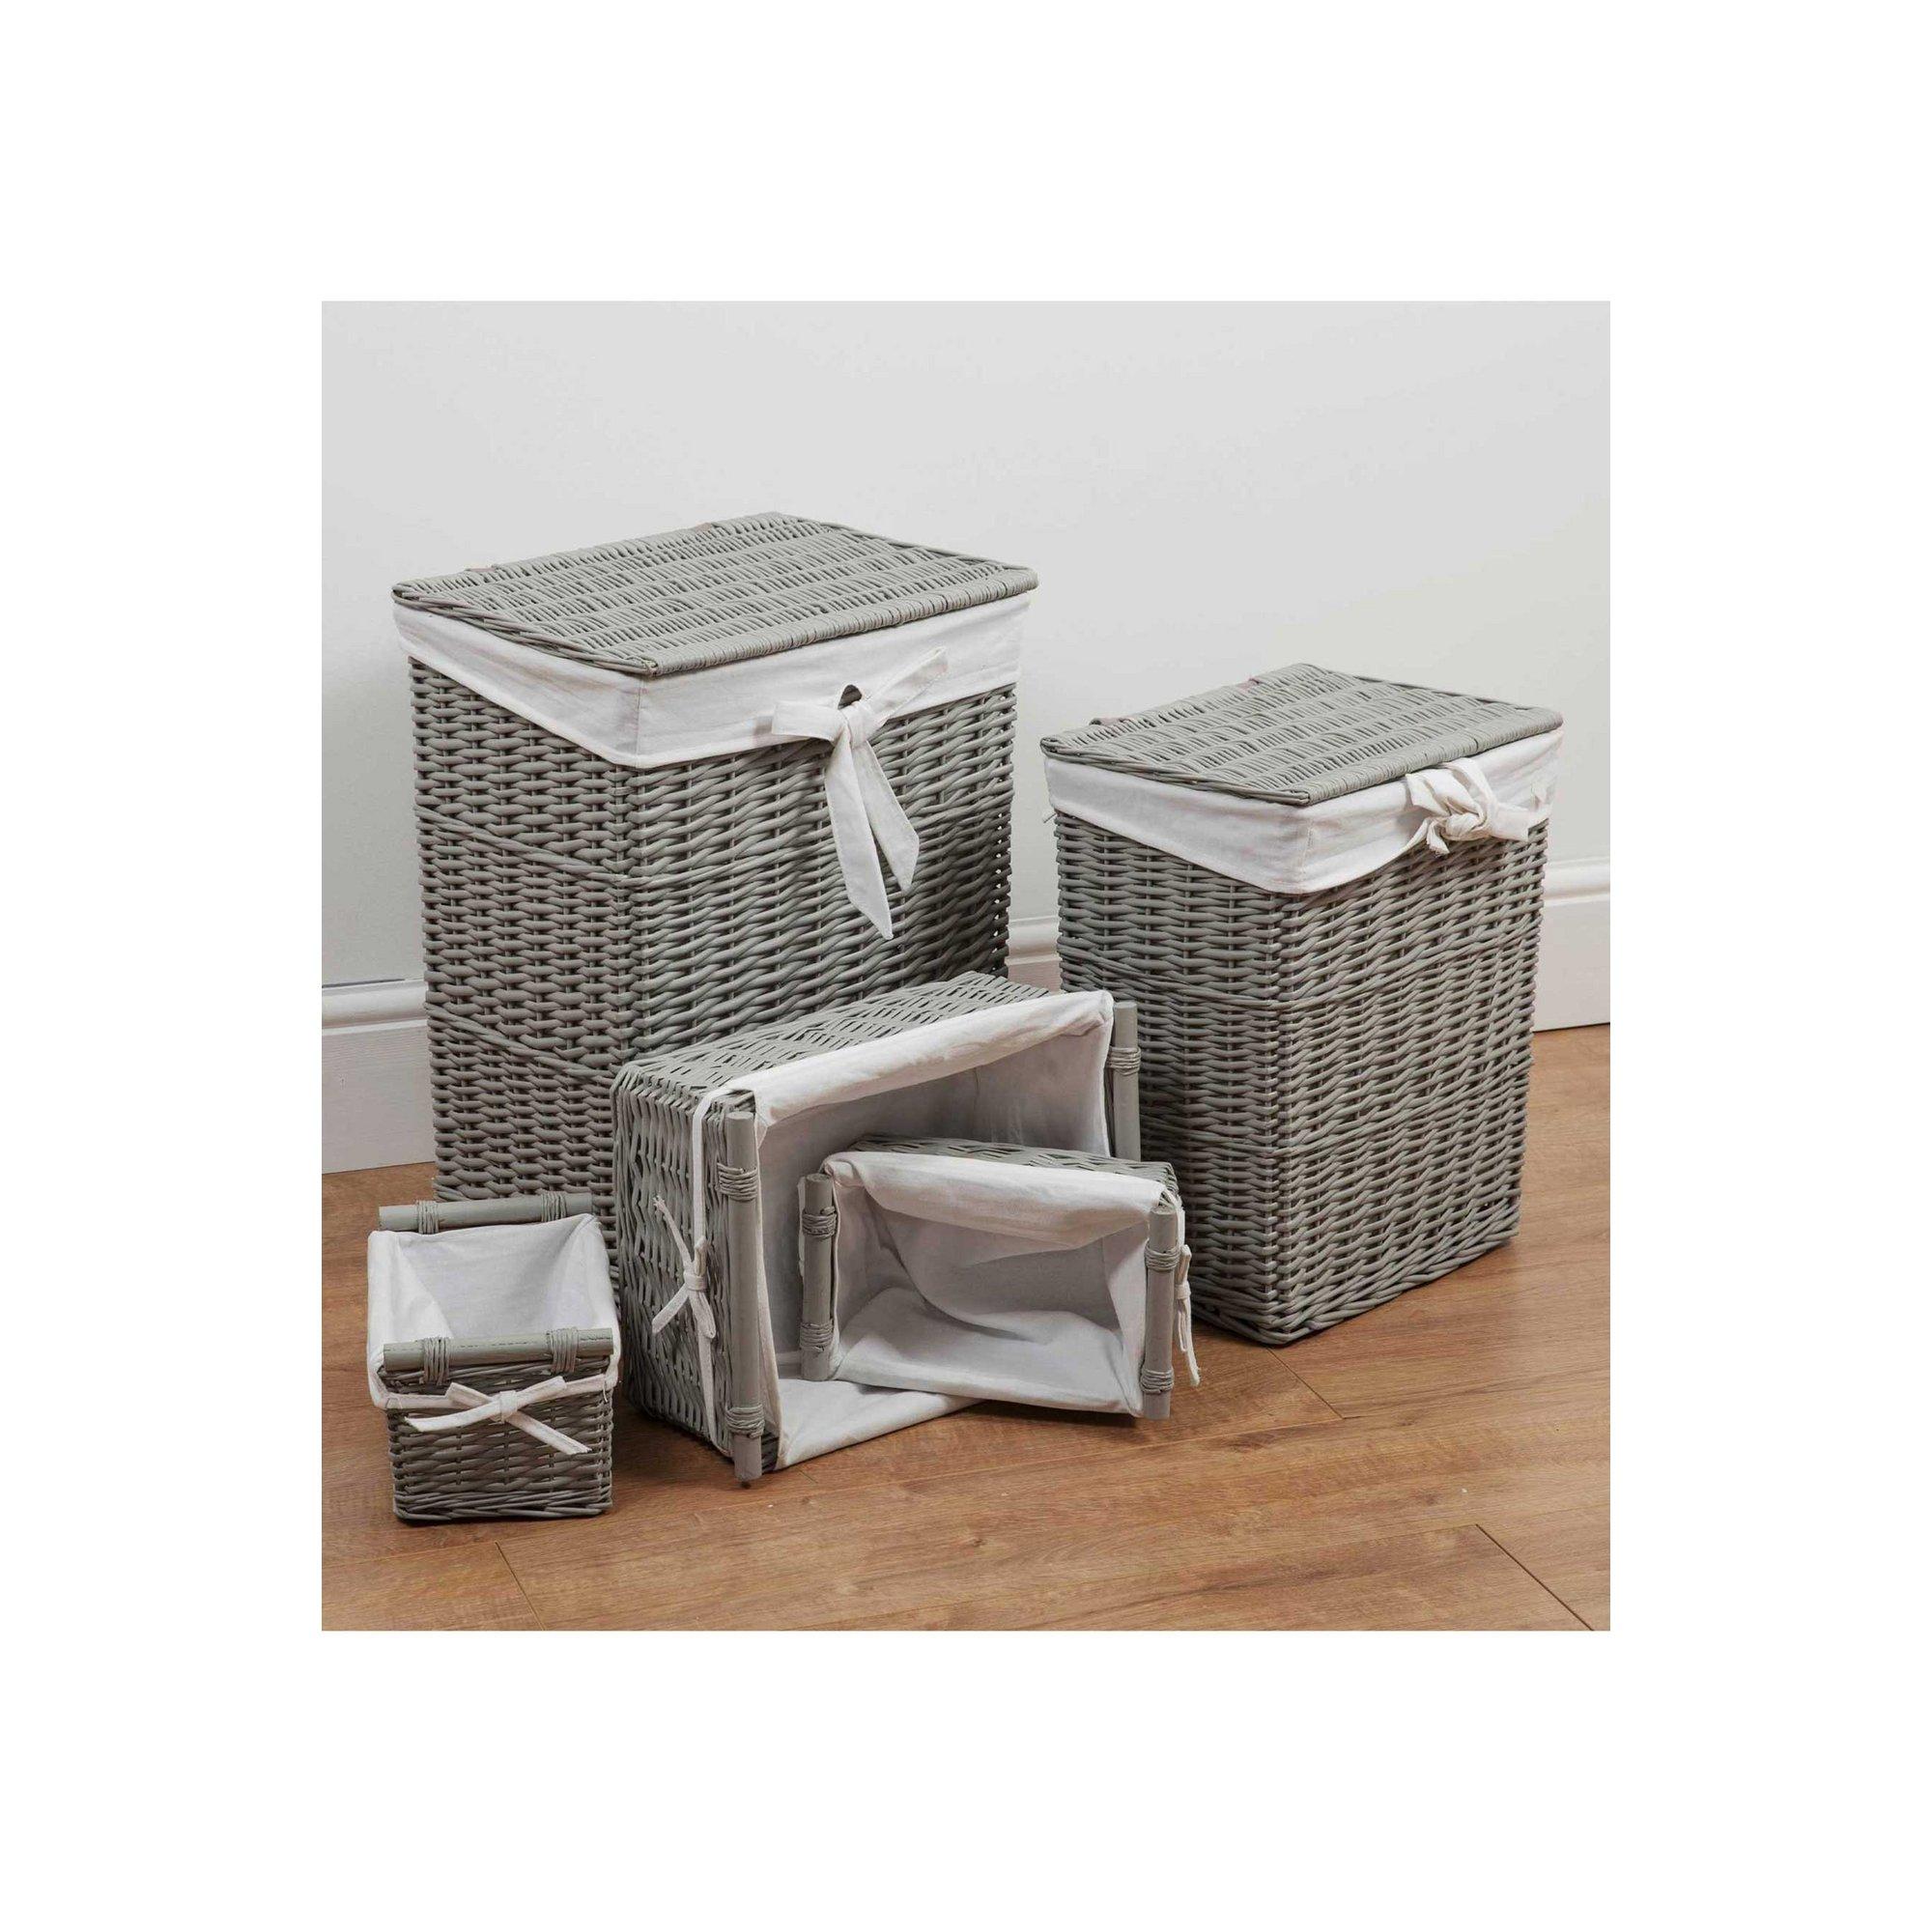 Image of Bambino Set of 5 Rectangular Storage Baskets